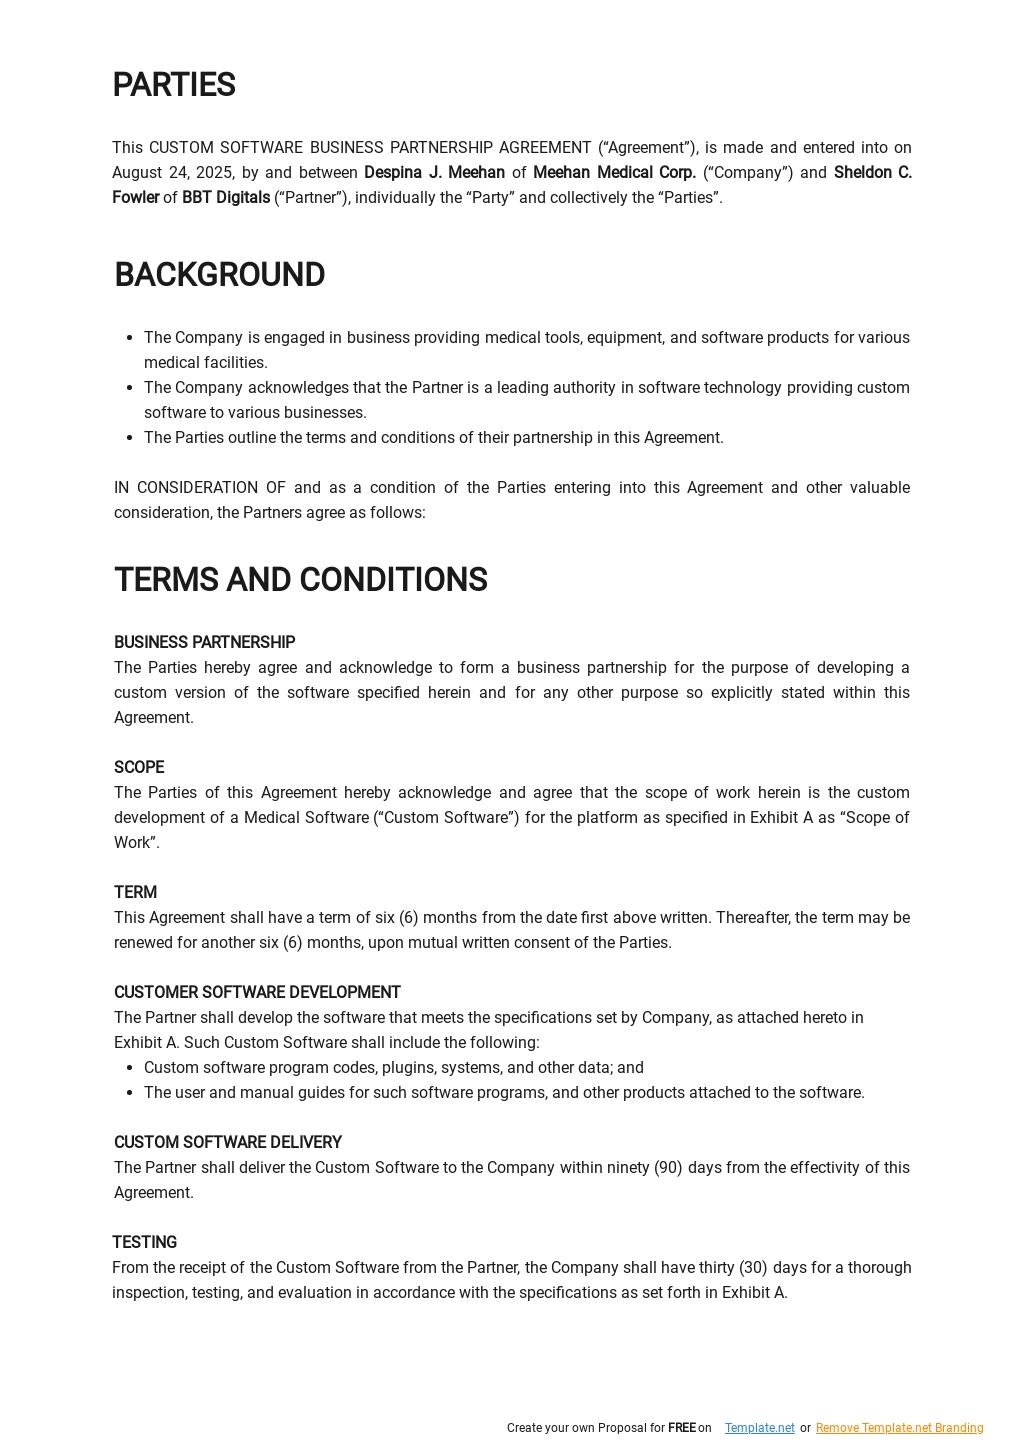 Custom Software Business Partnership Agreement Template 1.jpe